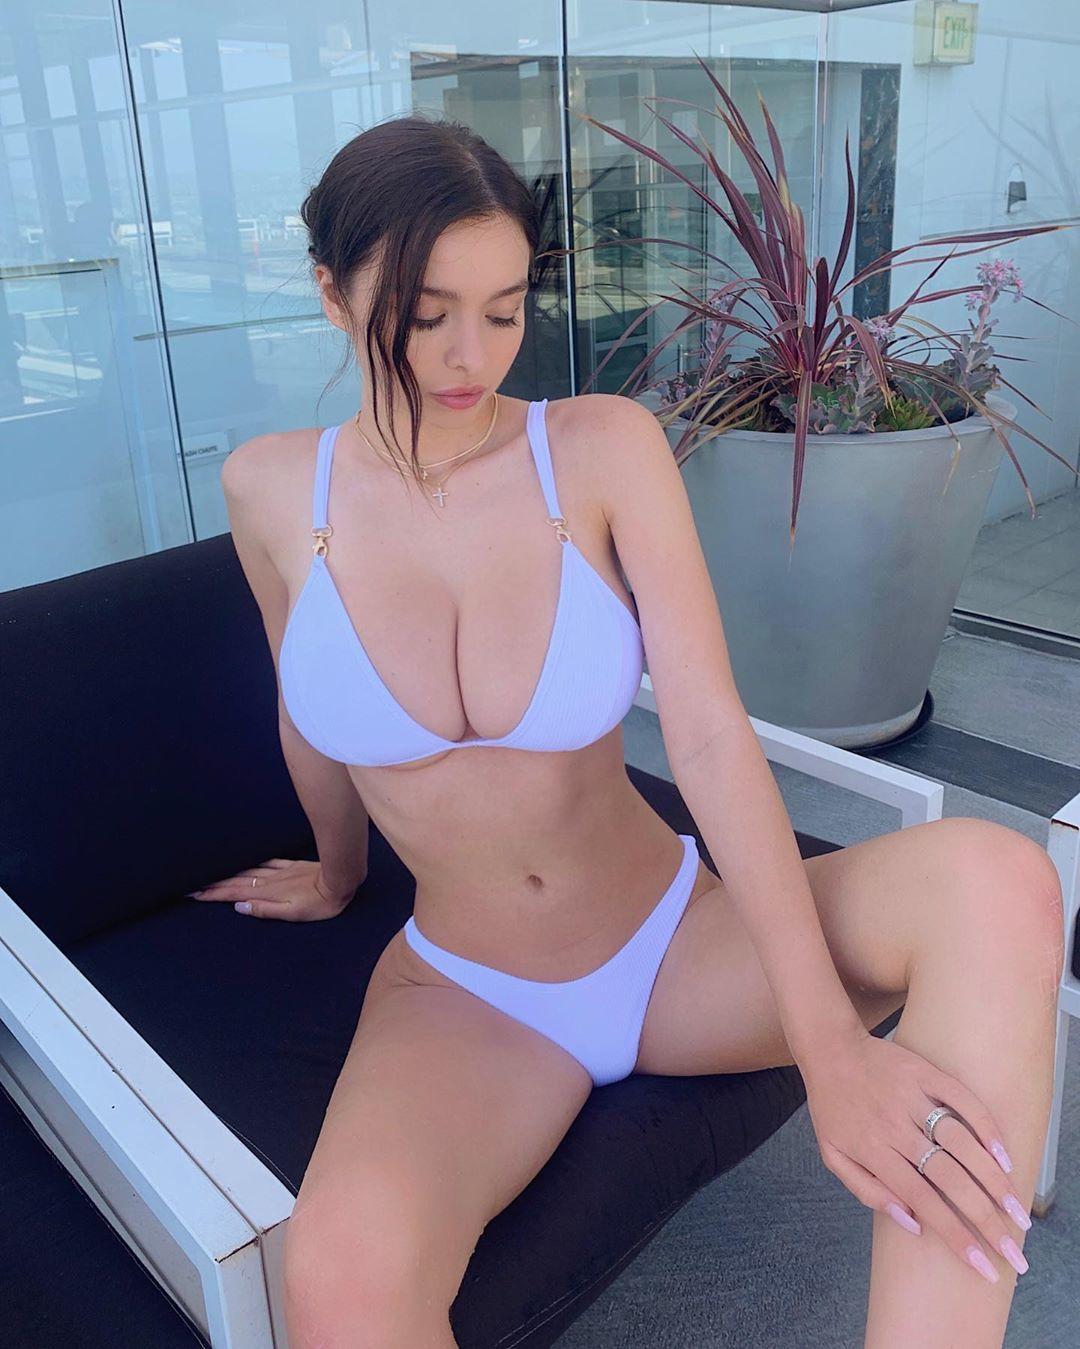 USA Model Beautiful Instagrammer Sophie Mudd047